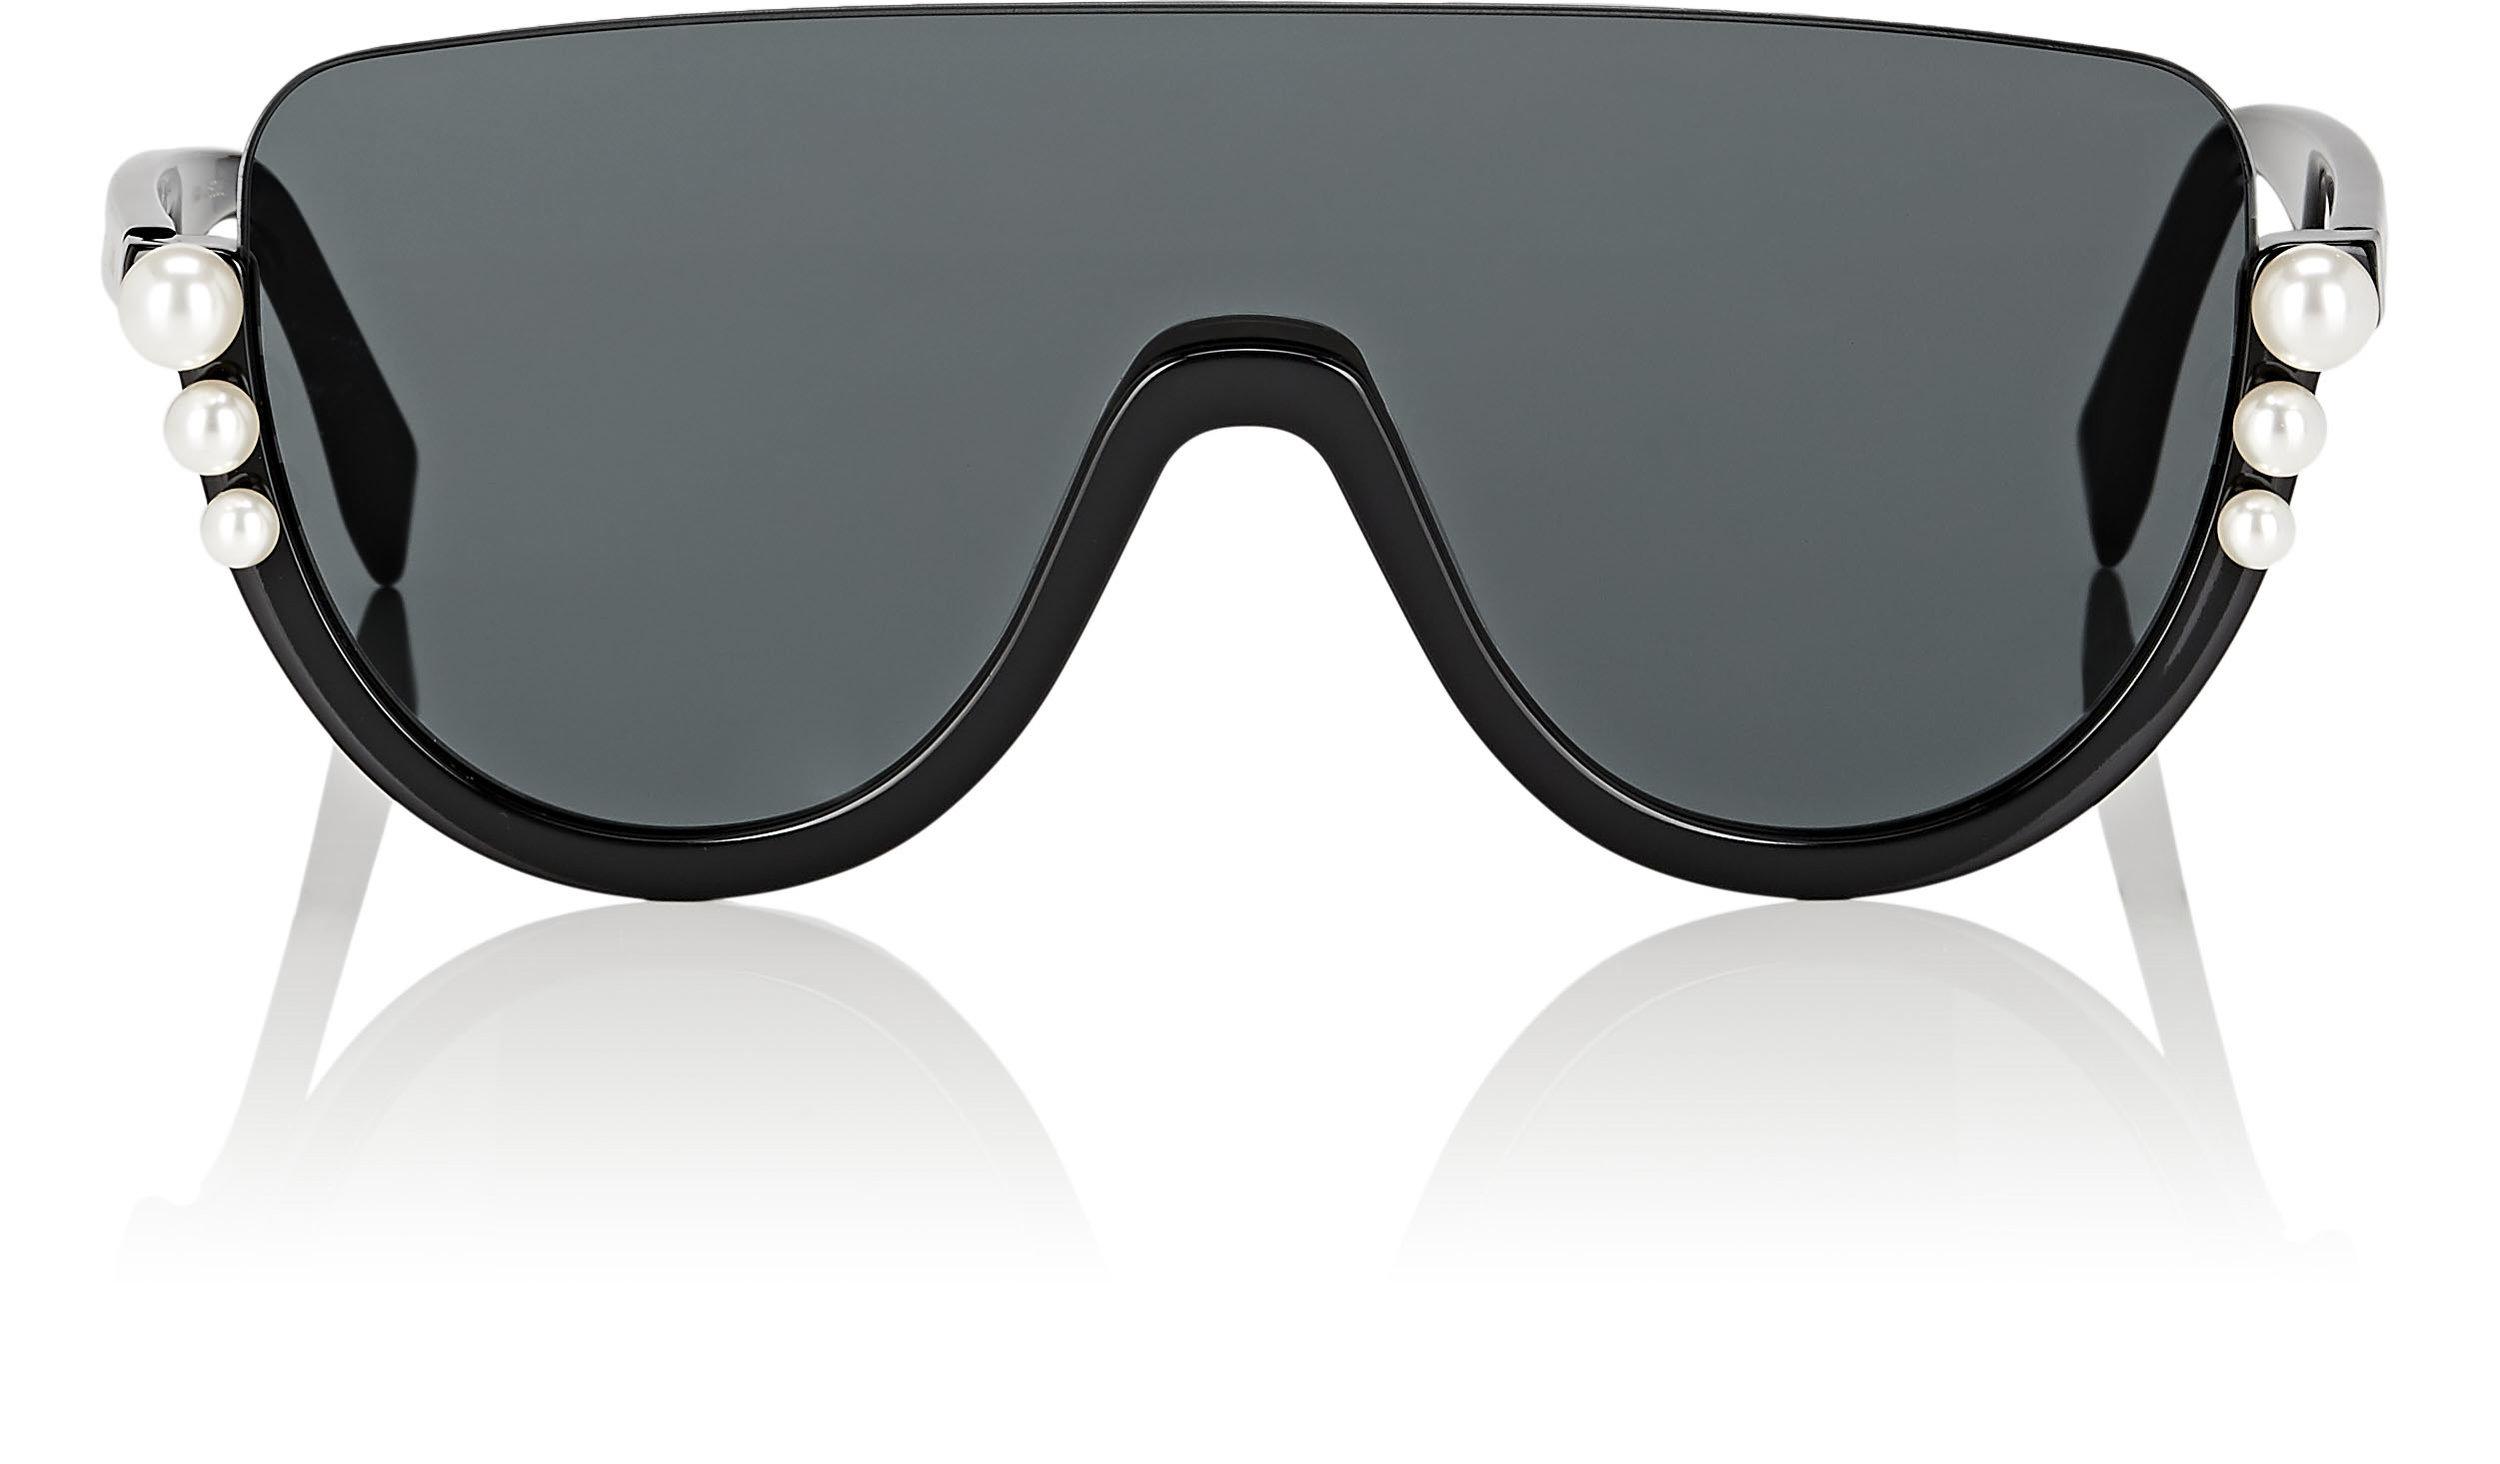 505631771_1_SunglassesFront.jpg